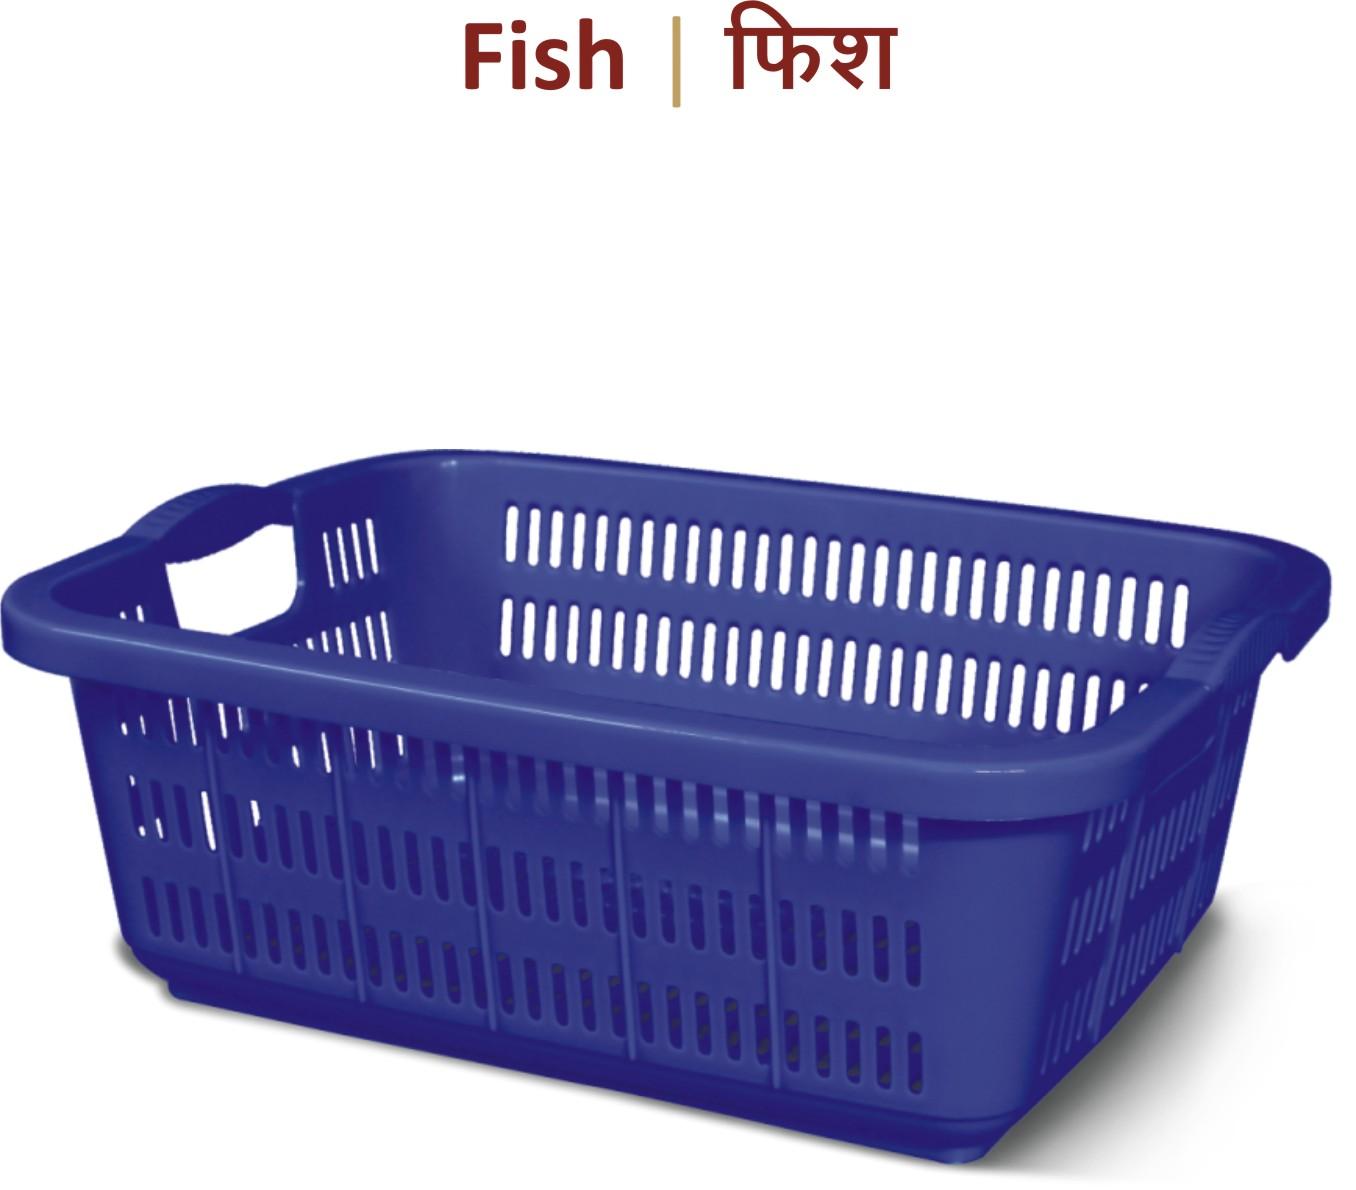 crate fish